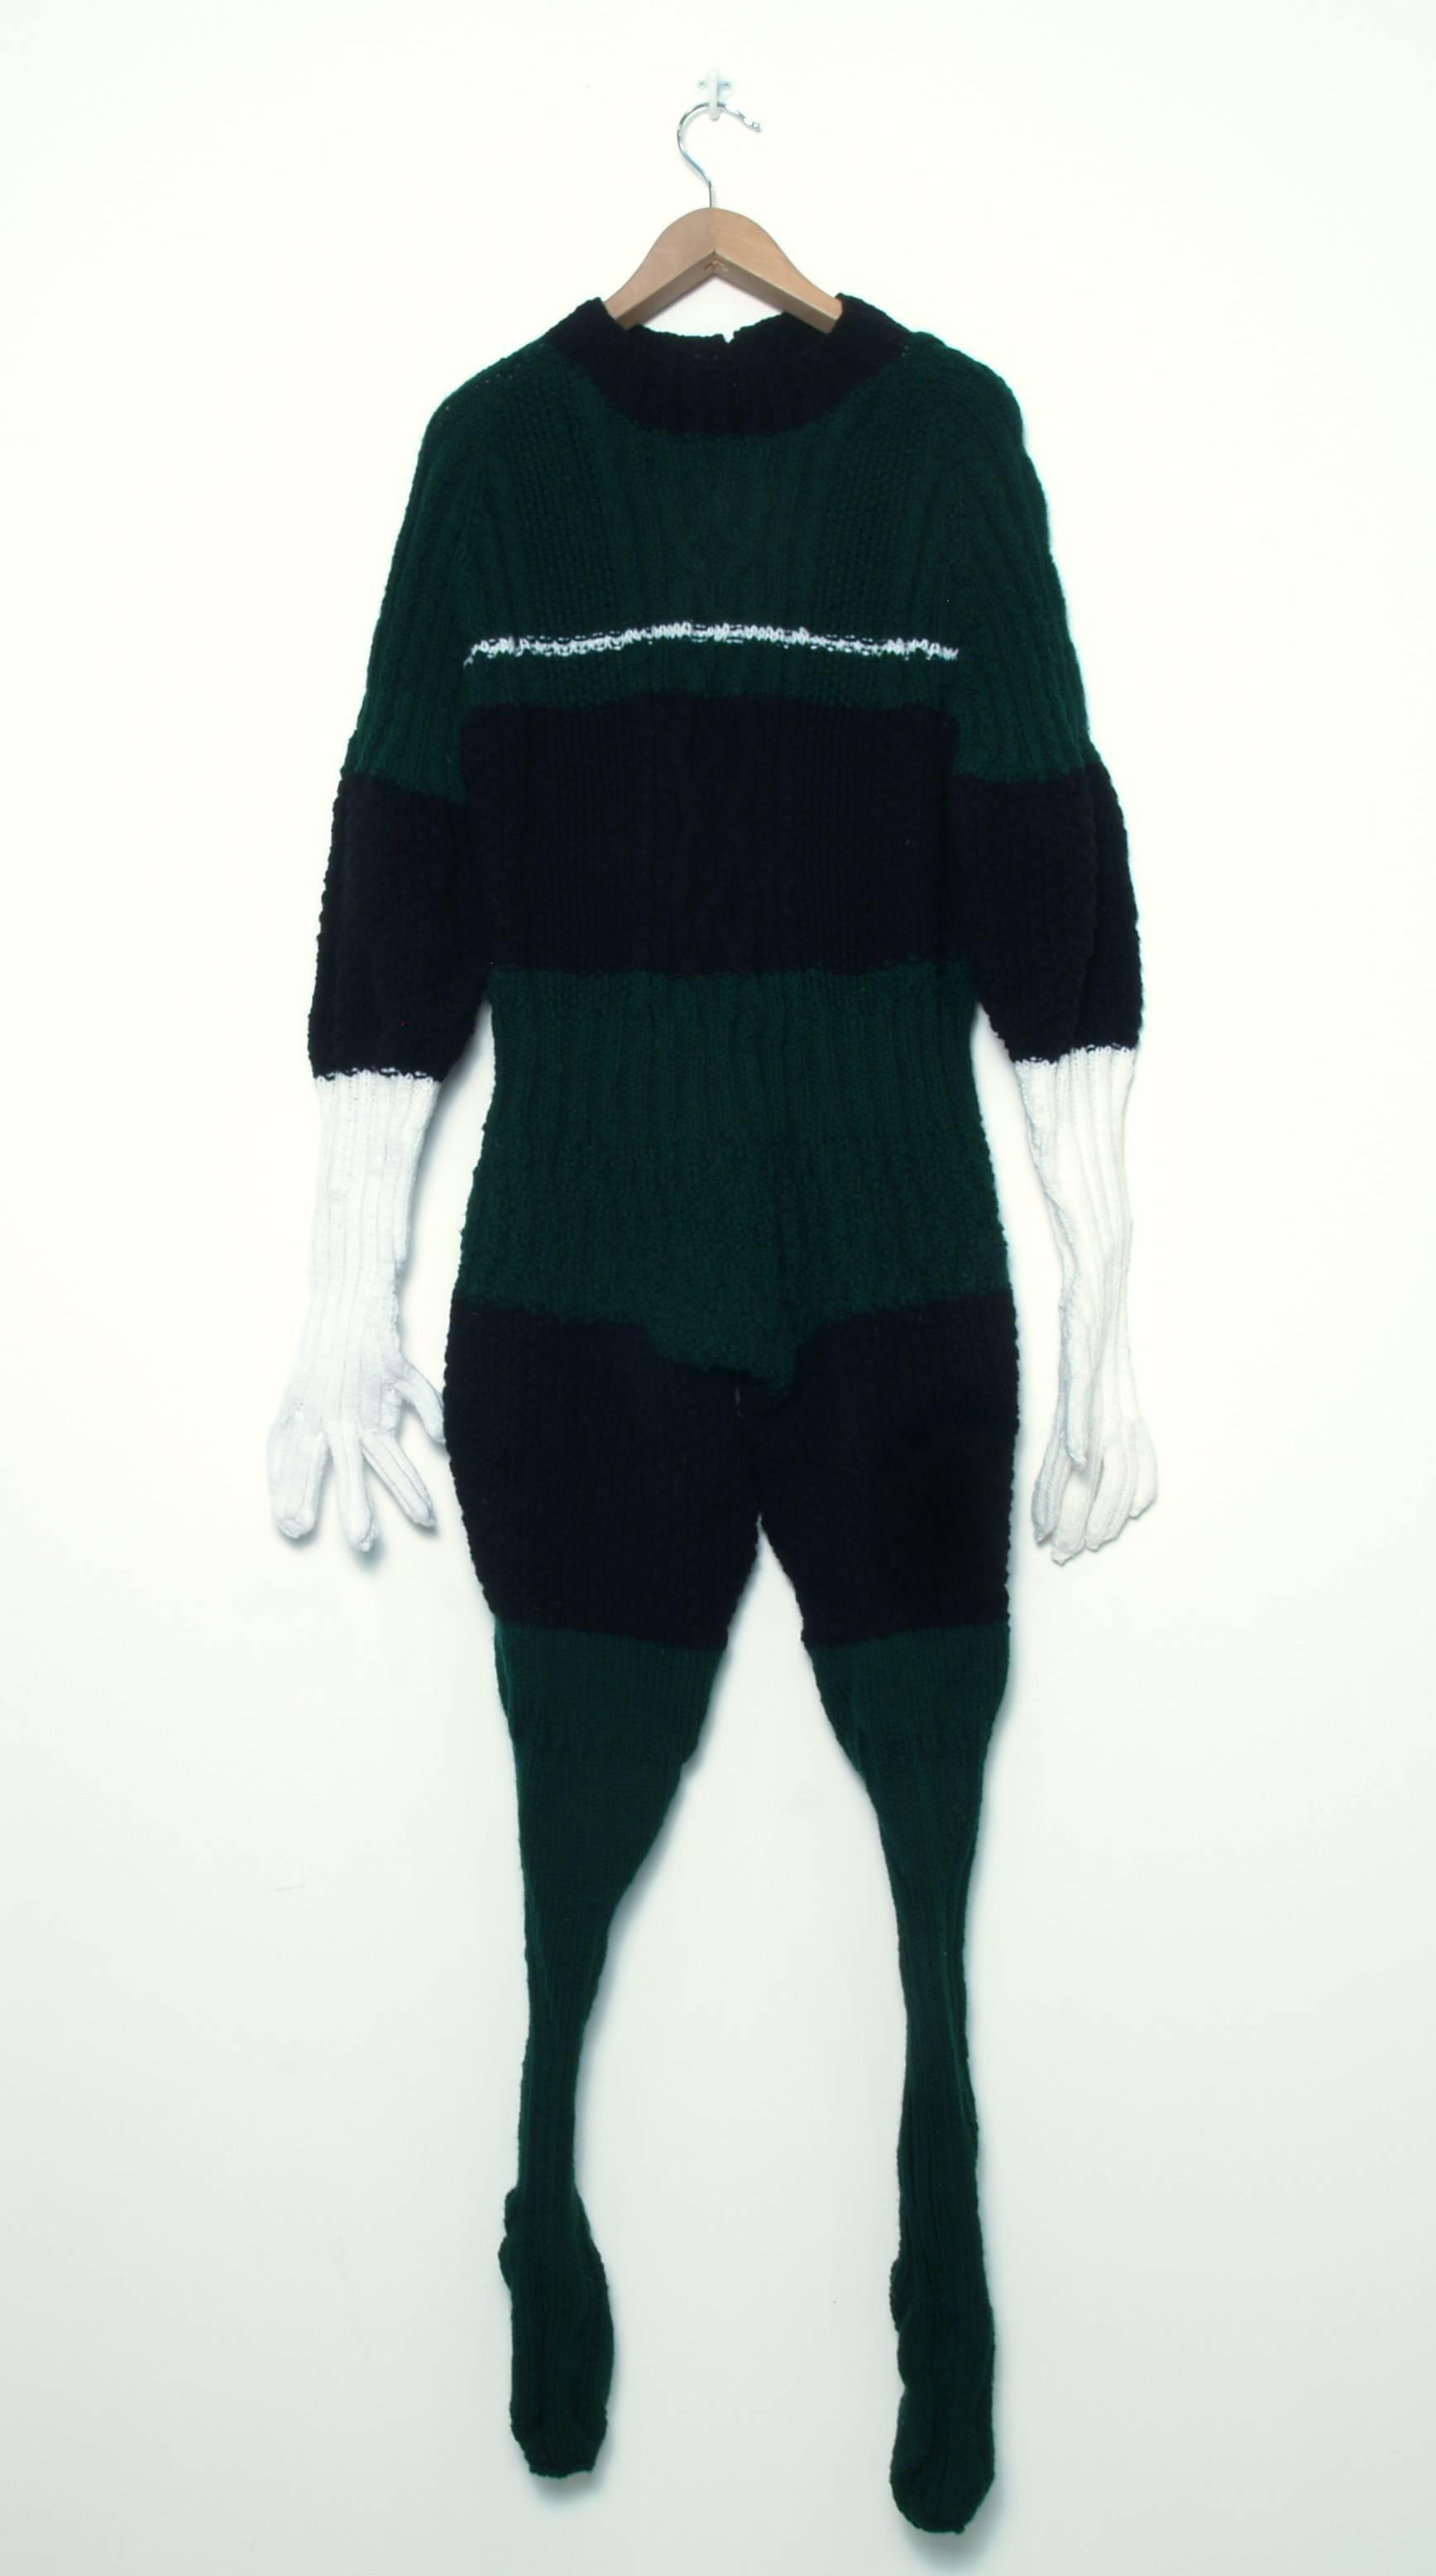 """Sweaterman 8"", Contemporary, Sculpture, Mixed Media, Hand Knit, Soft, Fiber"